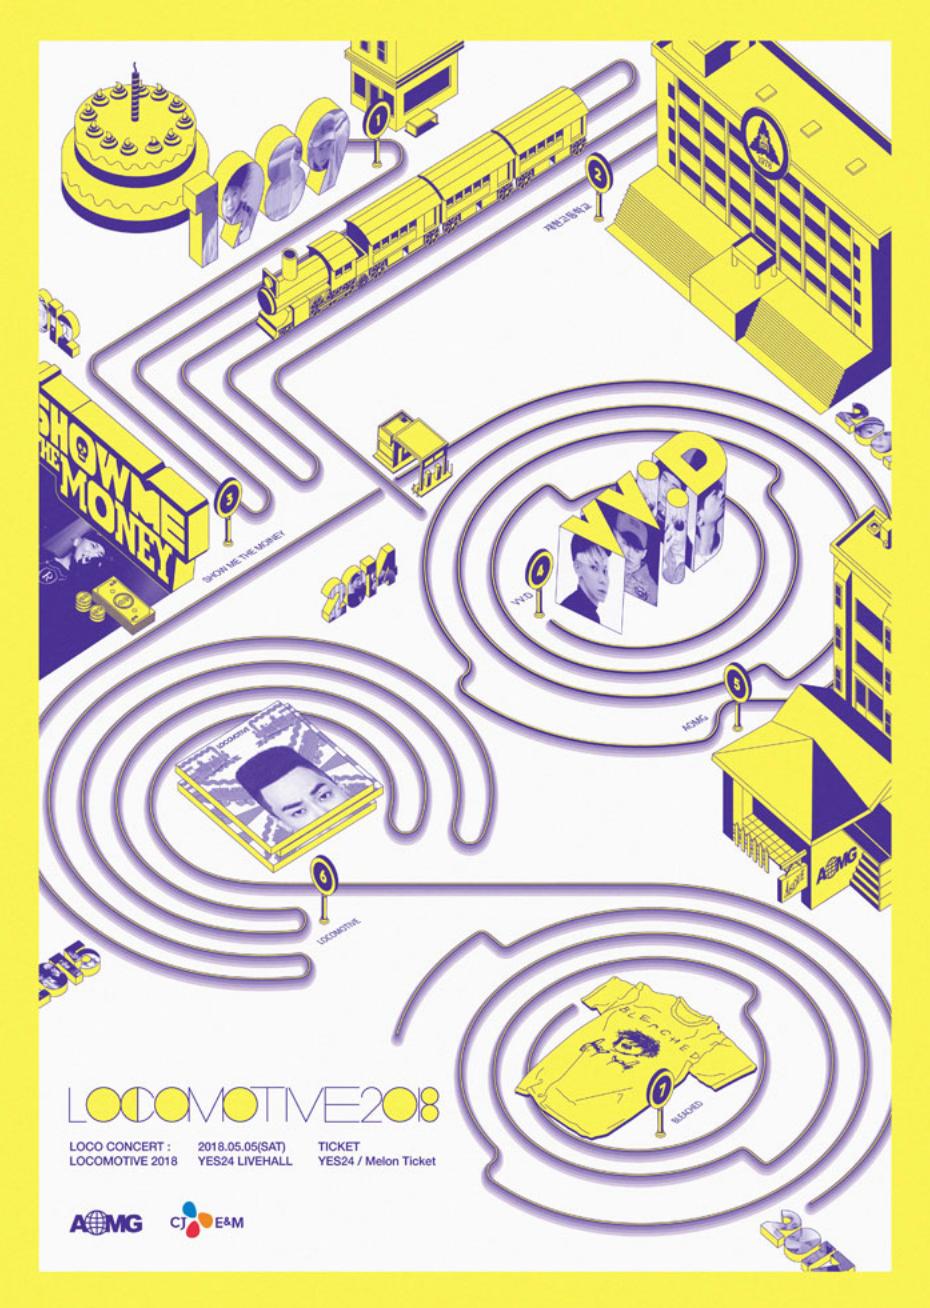 Lomotive 2018 Kpop Concert